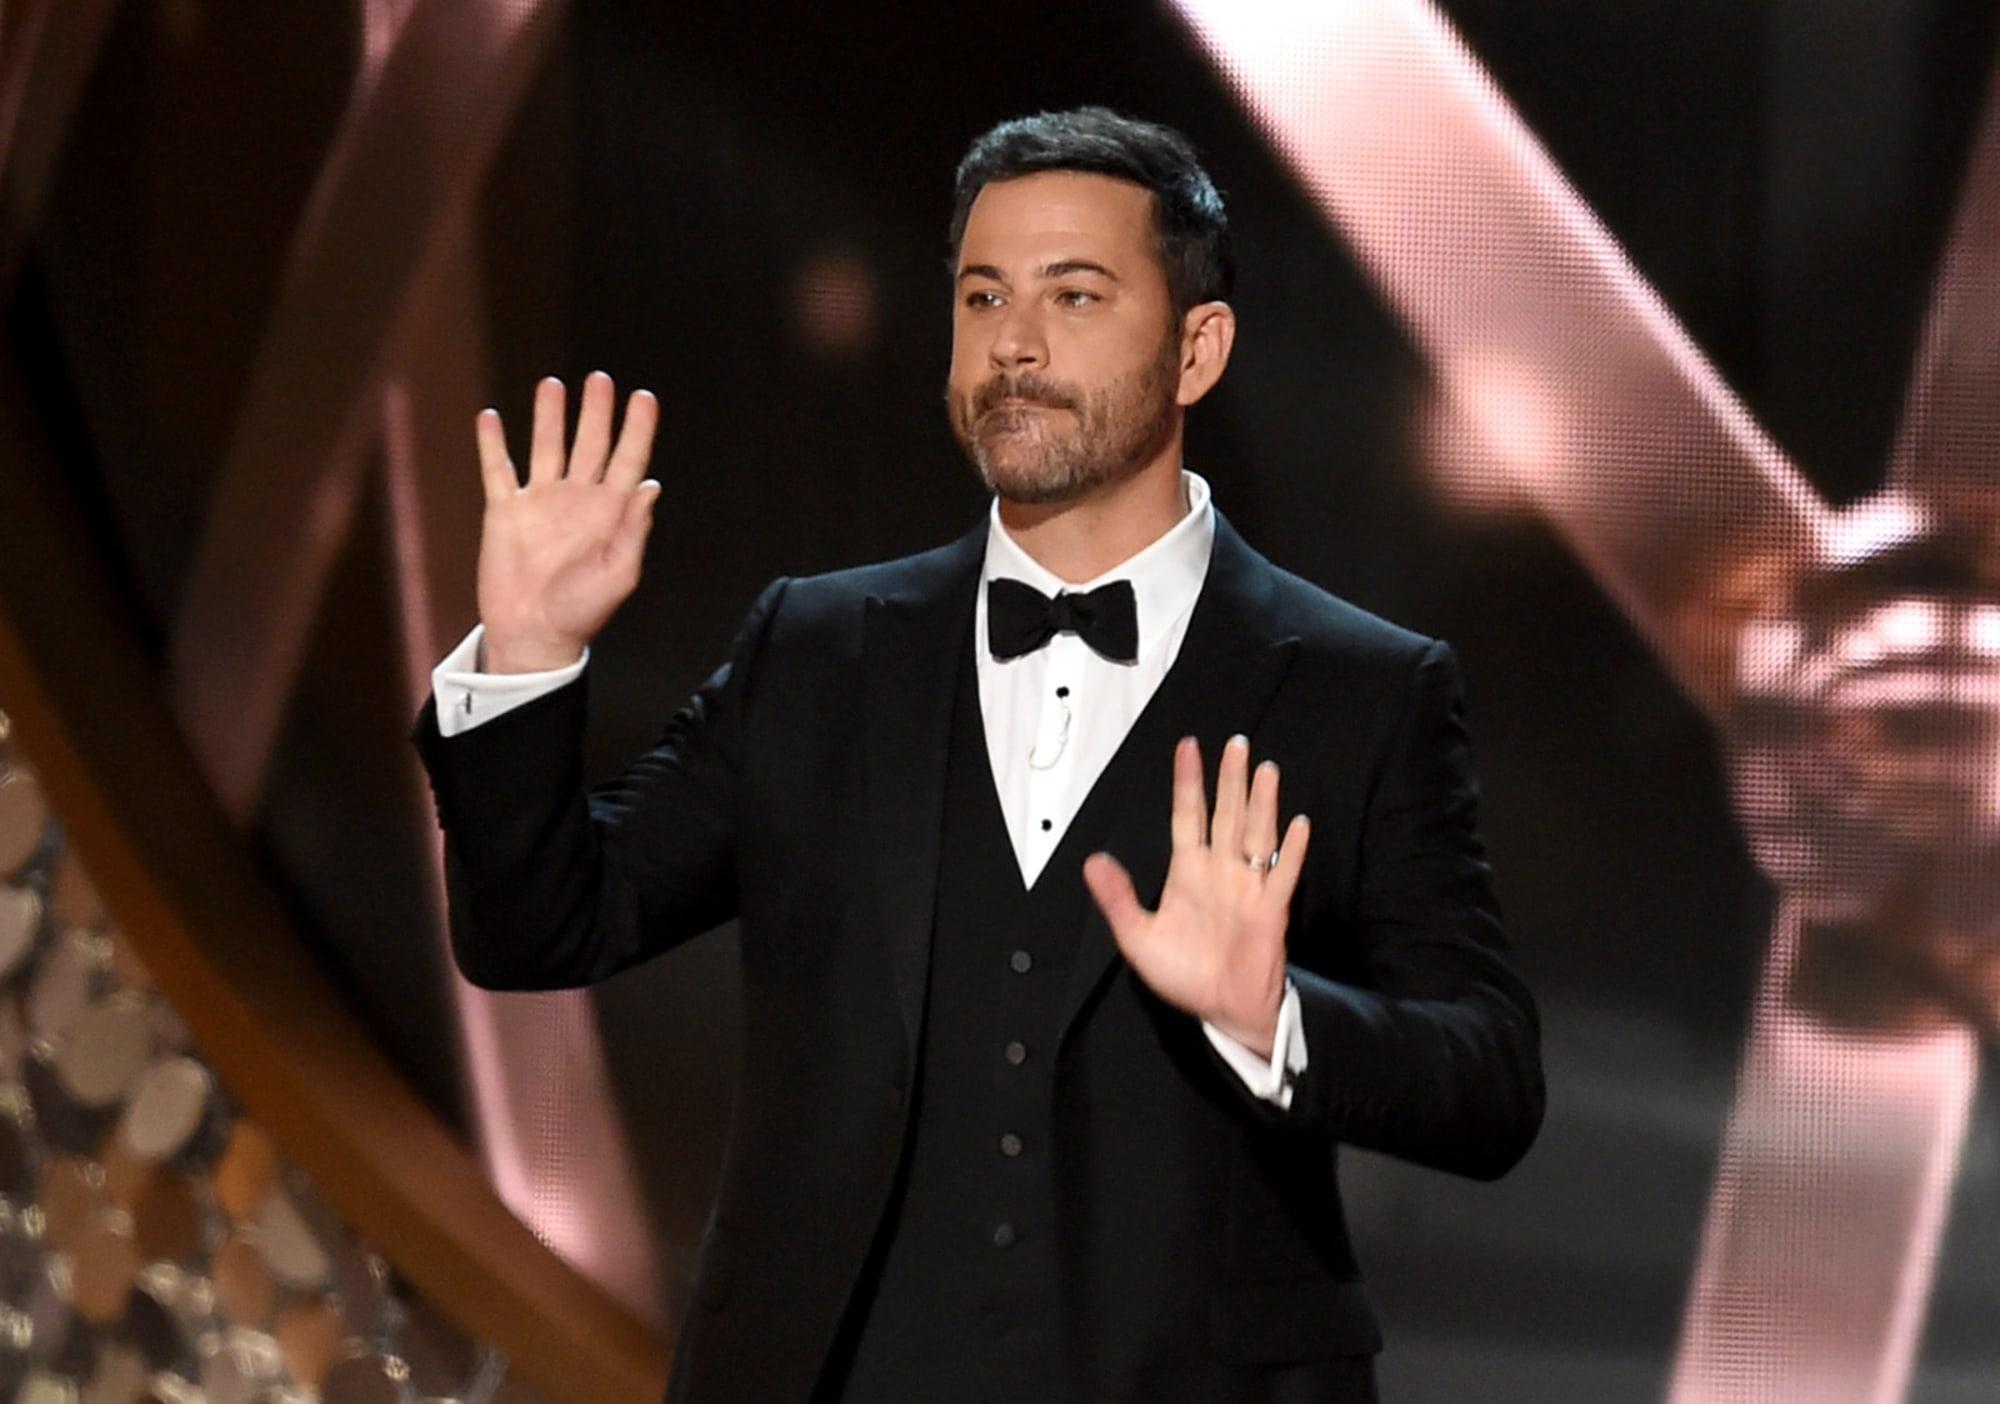 Is Jimmy Kimmel Live new tonight, November 25?